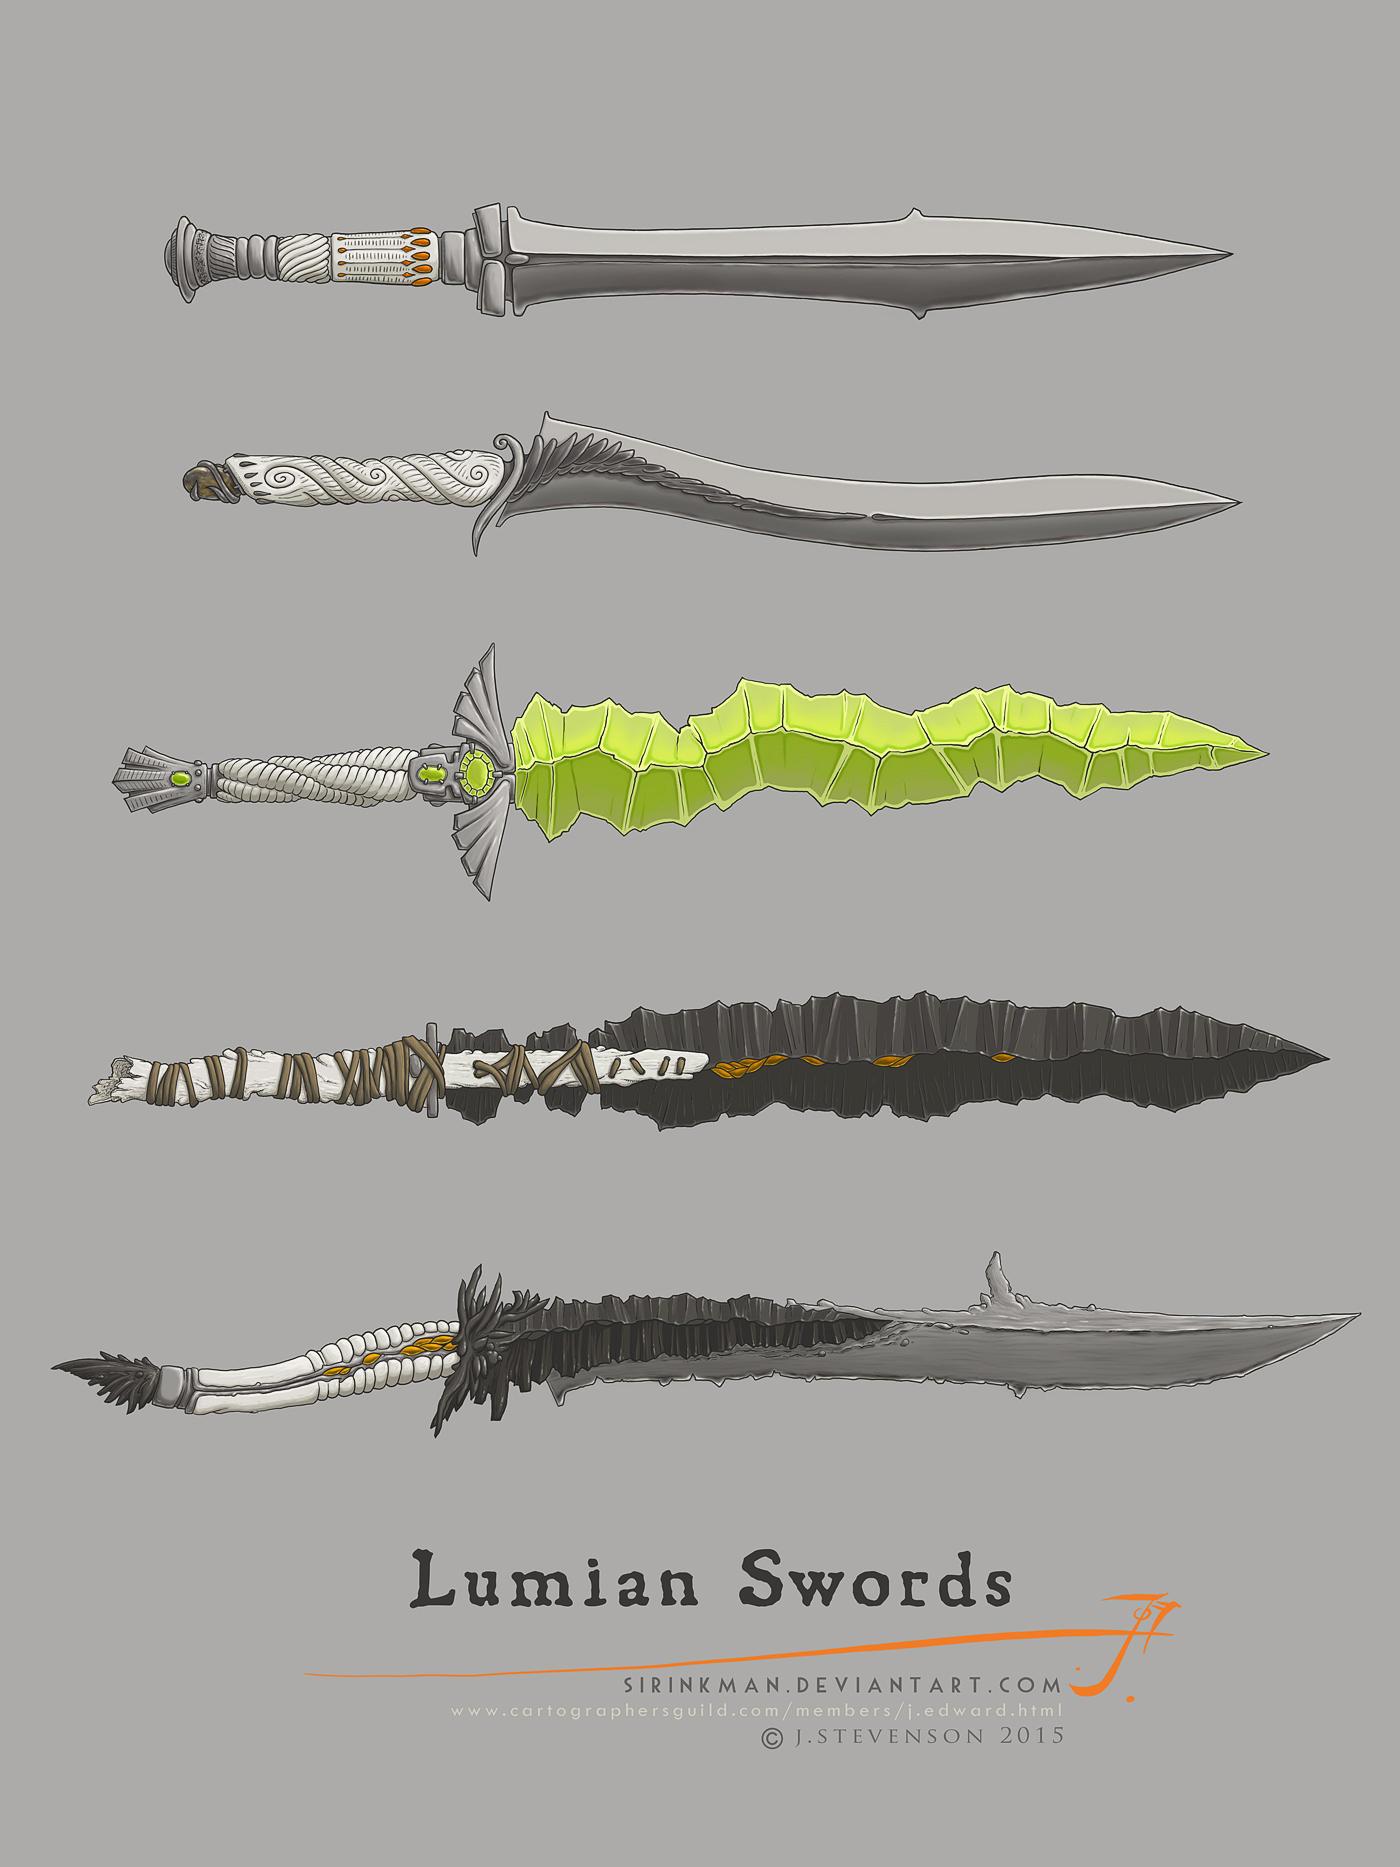 Lumian Swords [Color M] by SirInkman